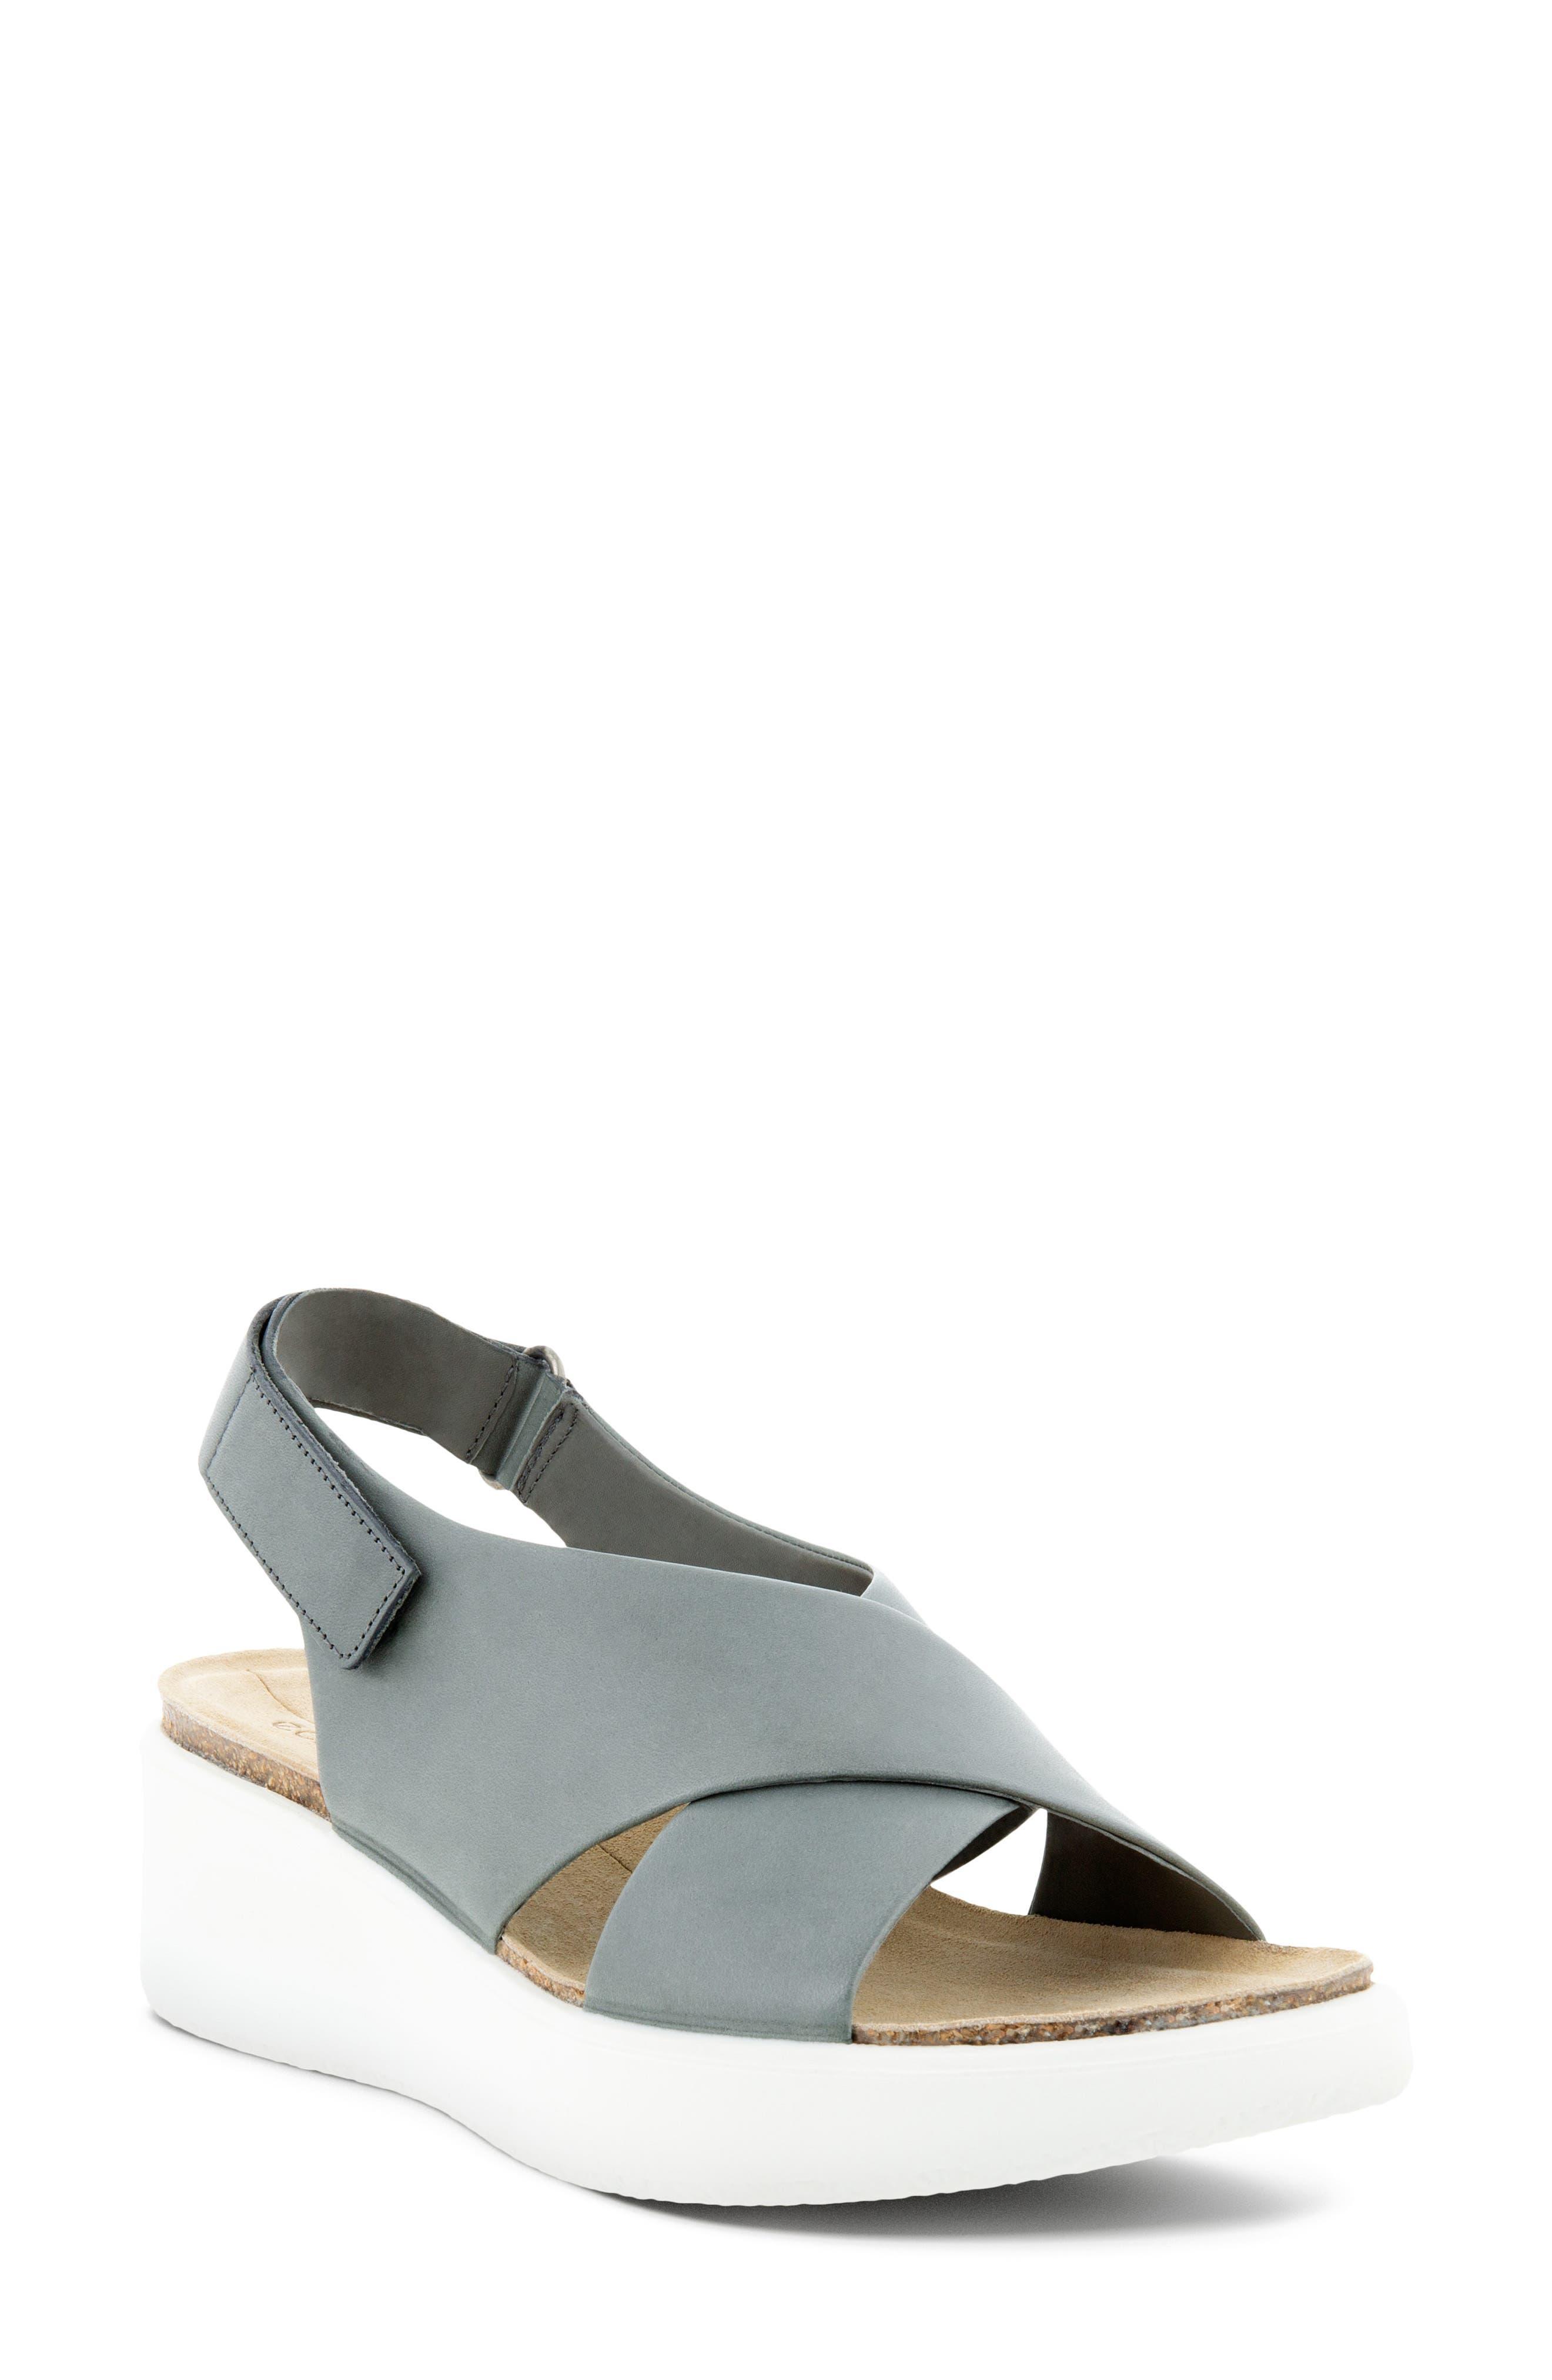 Women's Ecco Corksphere Wedge Sandal